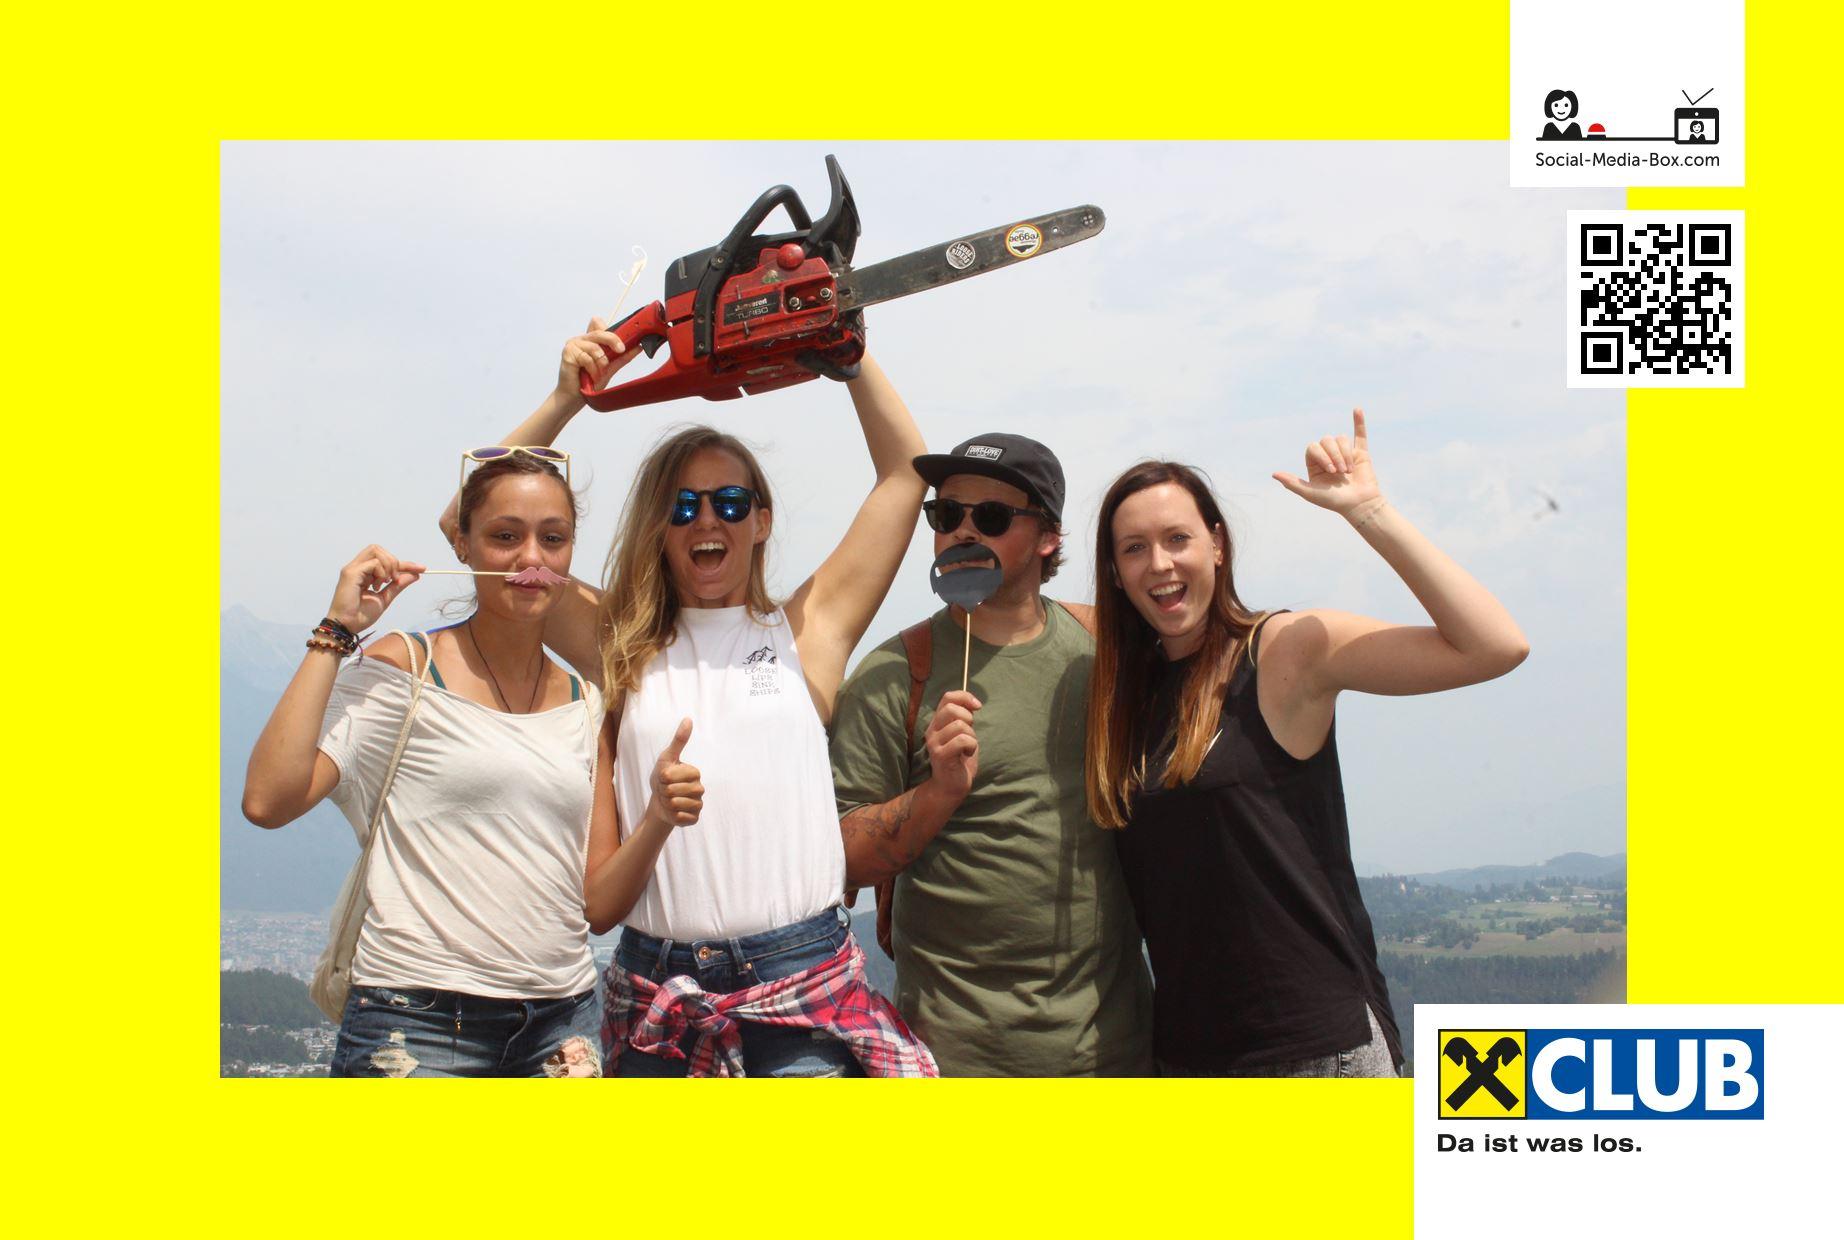 Crankworx_stokesix_raibaclubtirol_Print3